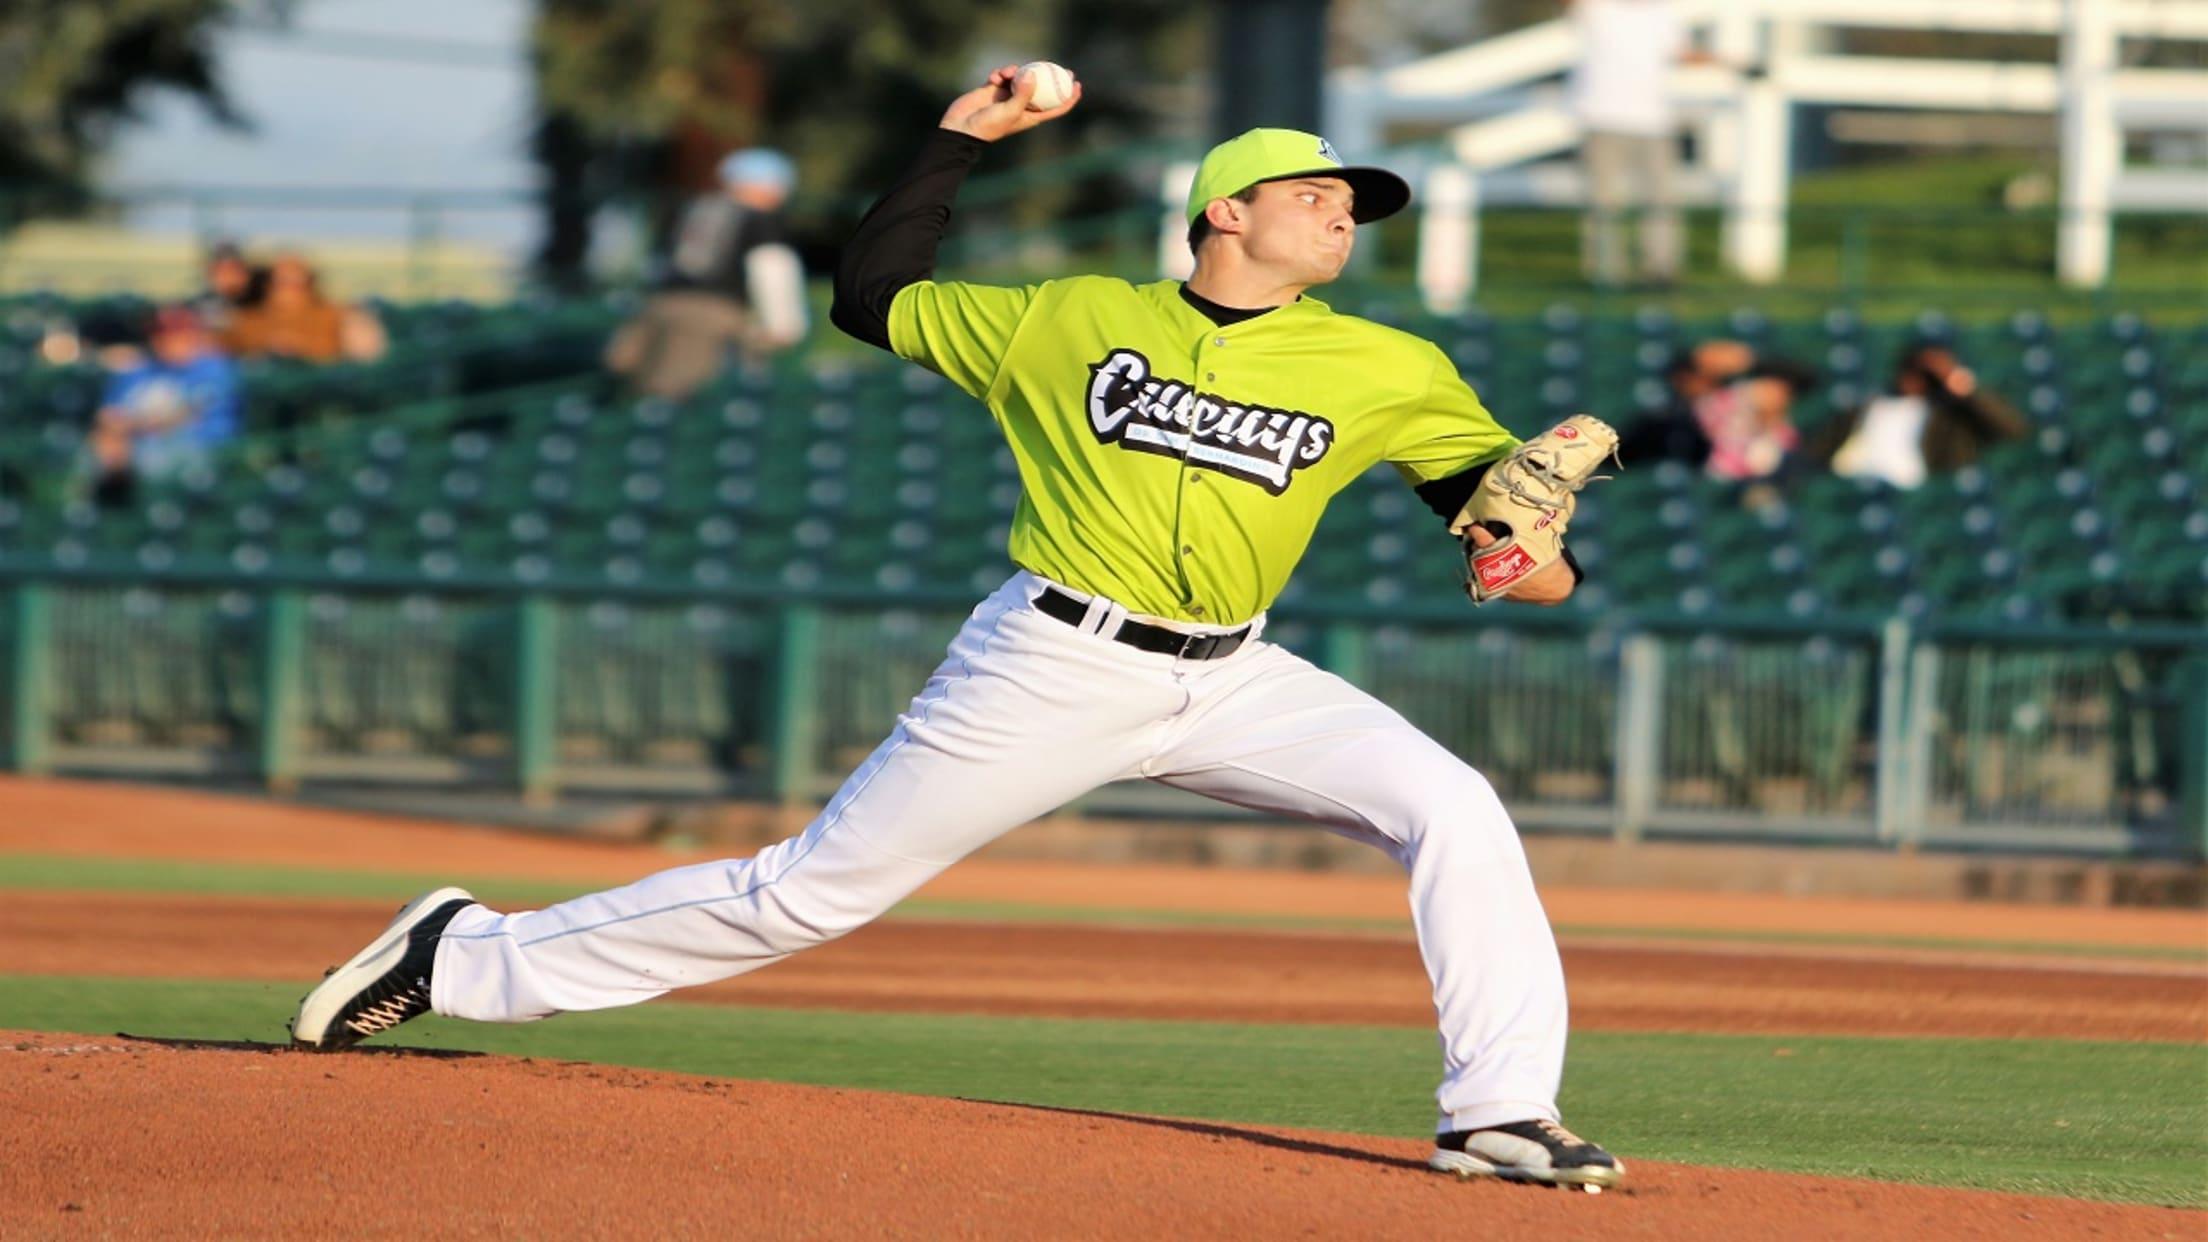 Top Prospects: Rodriguez, LAA